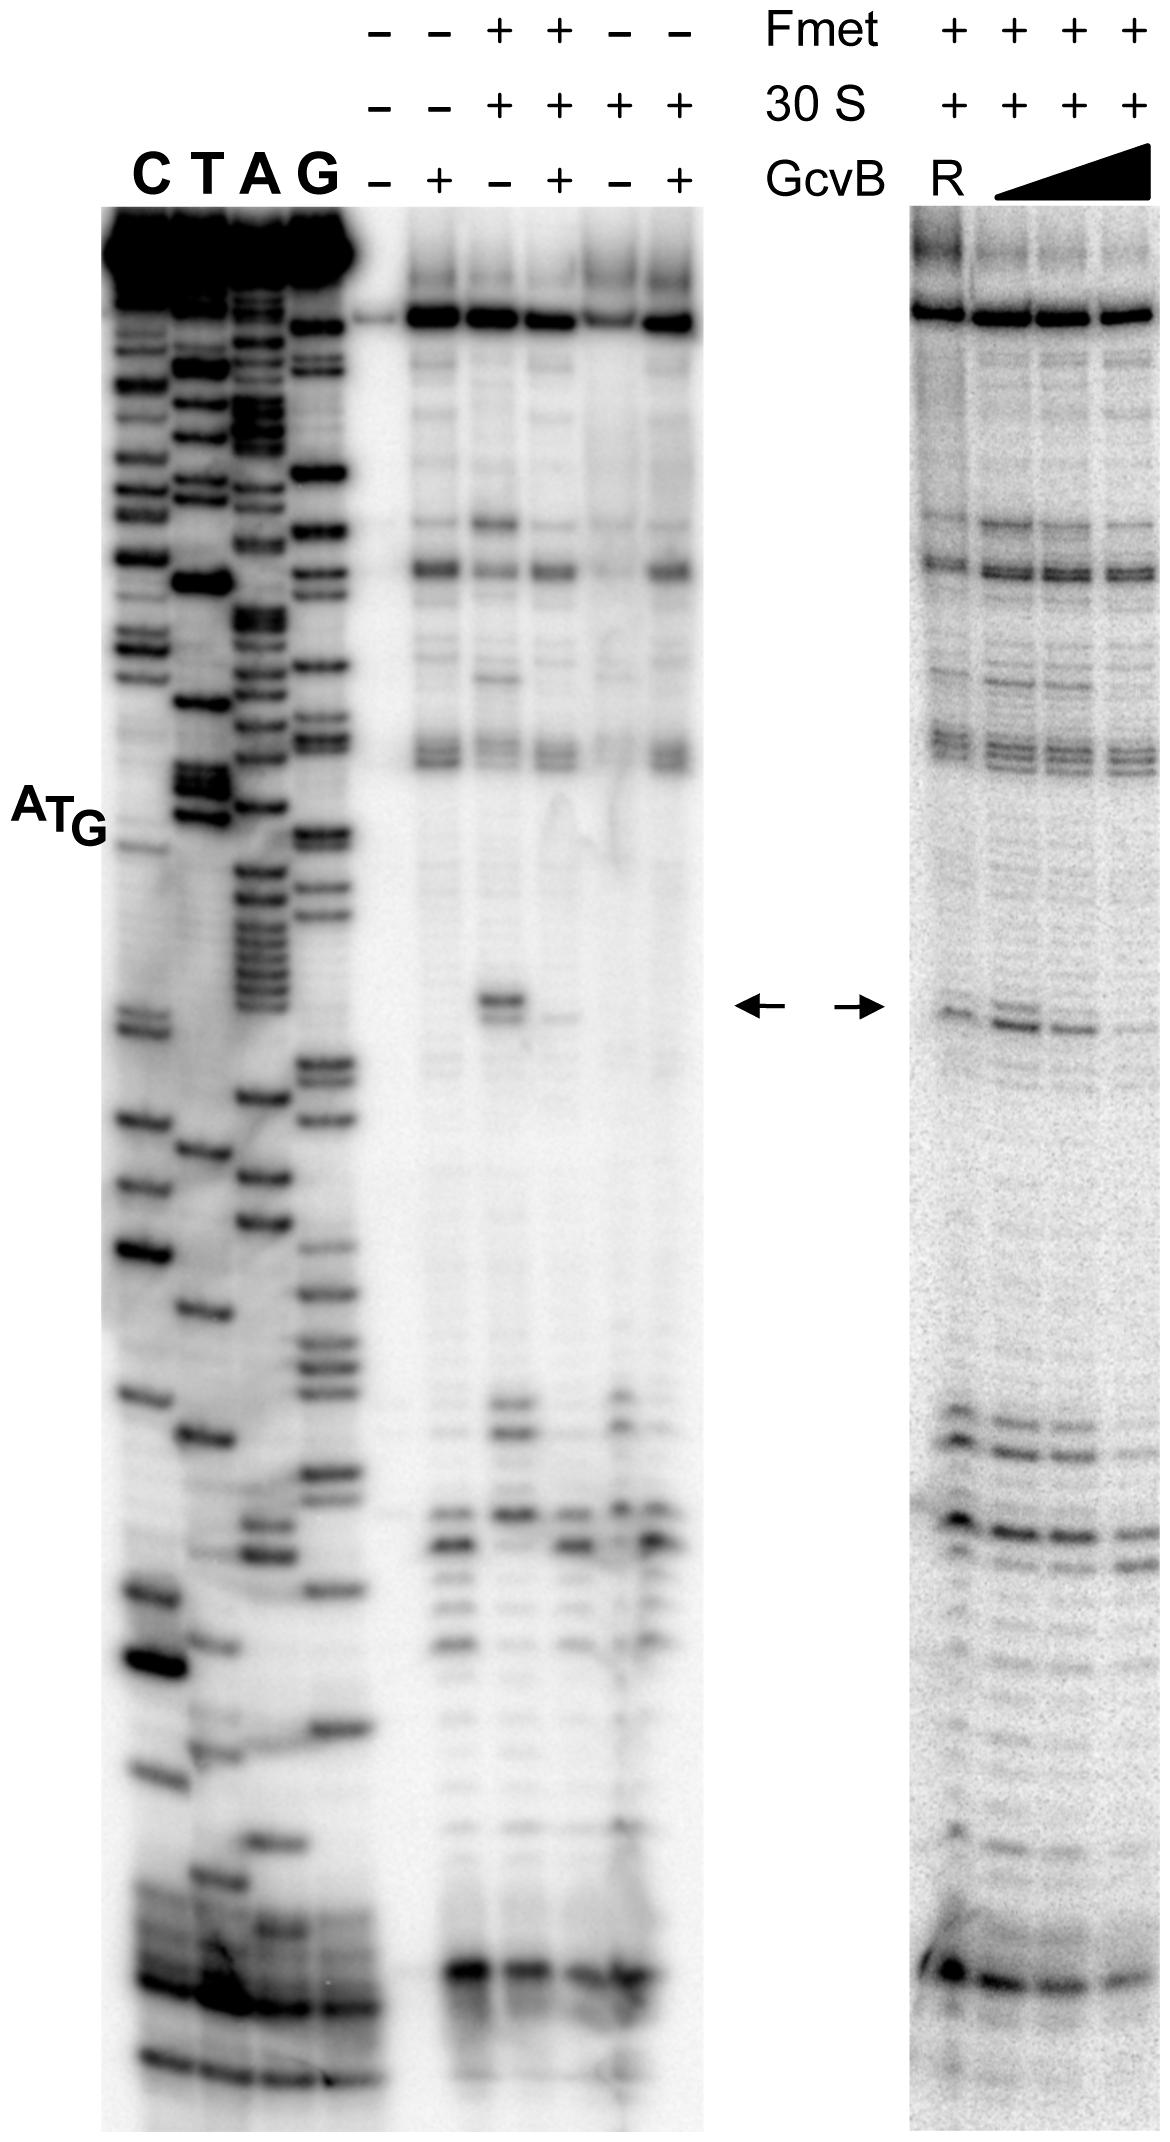 Toeprinting analysis of <i>yifK</i> mRNA.